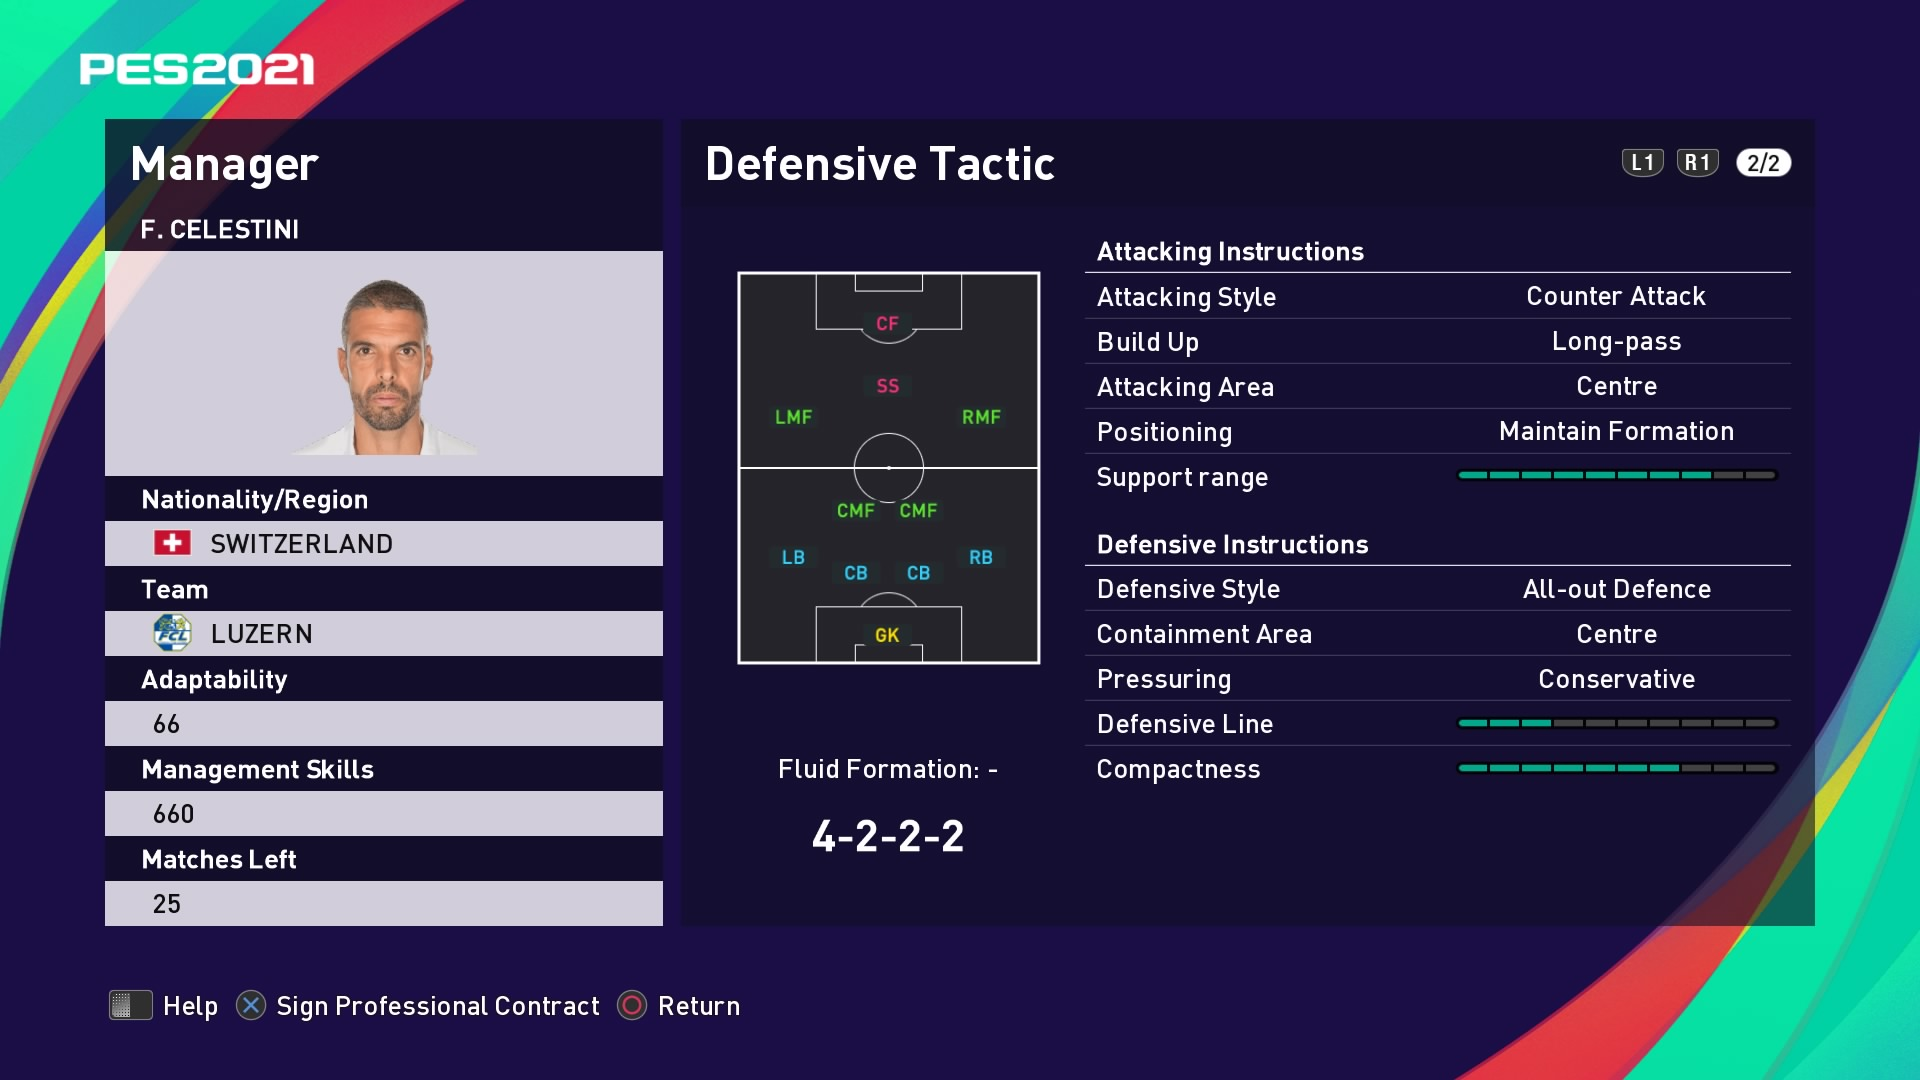 F. Celestini (Fabio Celestini) Defensive Tactic in PES 2021 myClub